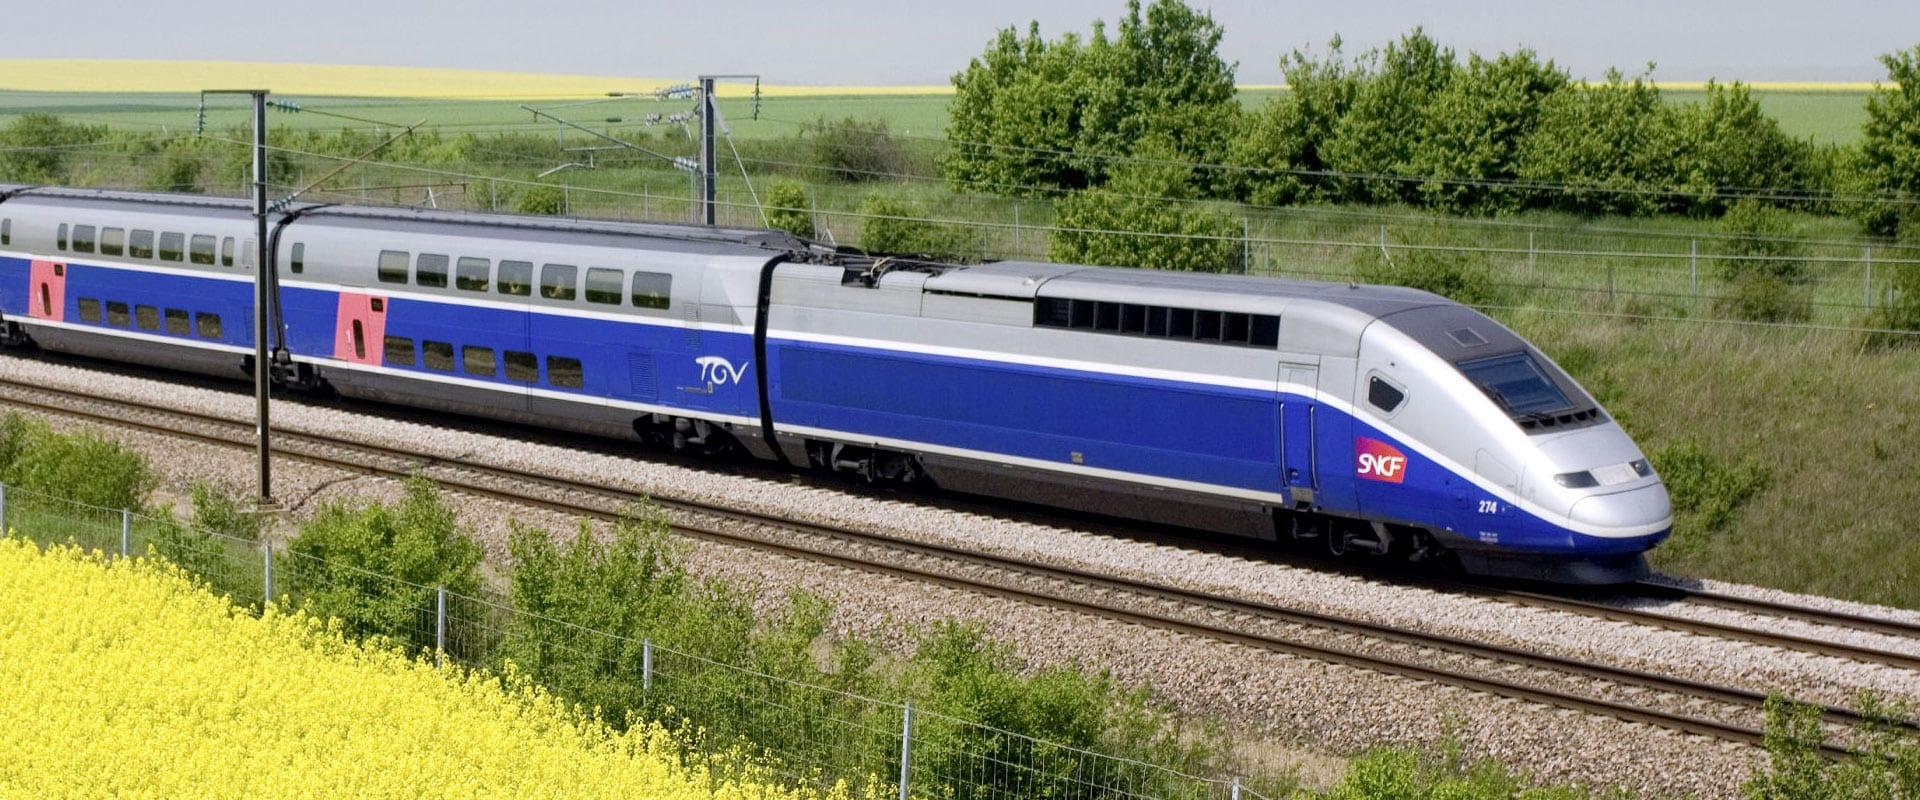 Trem de Barcelona a Paris